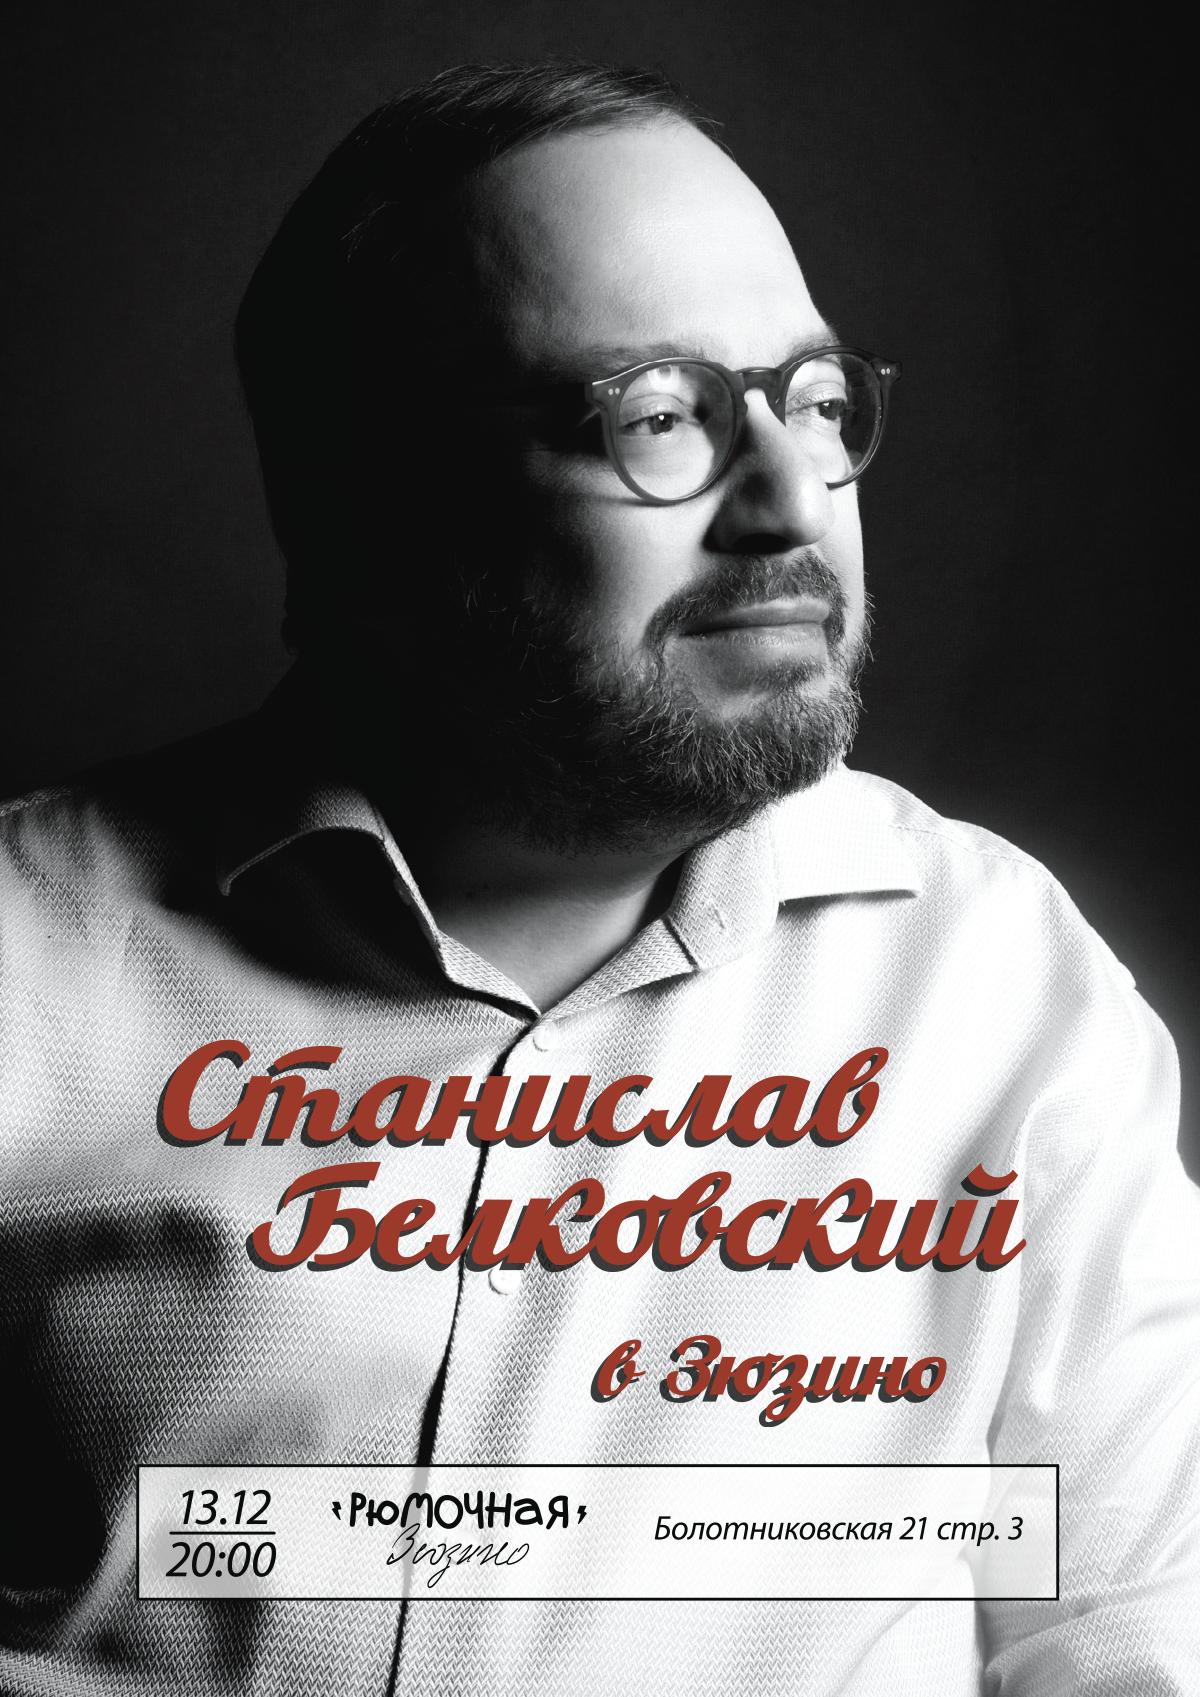 Станислав Белковский